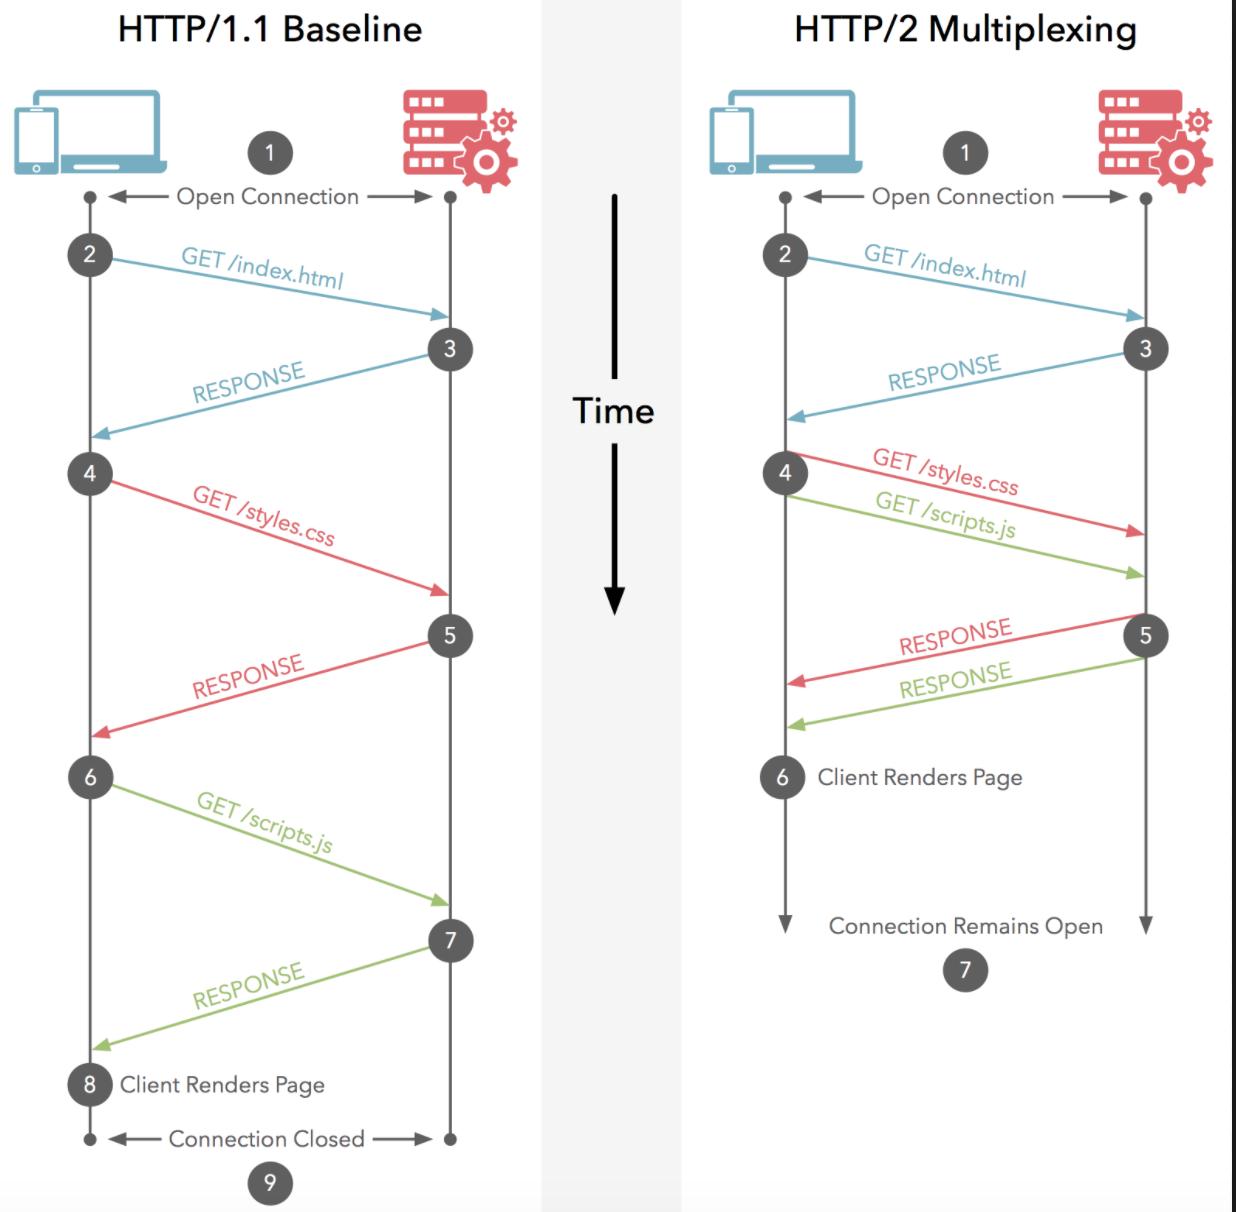 http2.0 Multiplexing